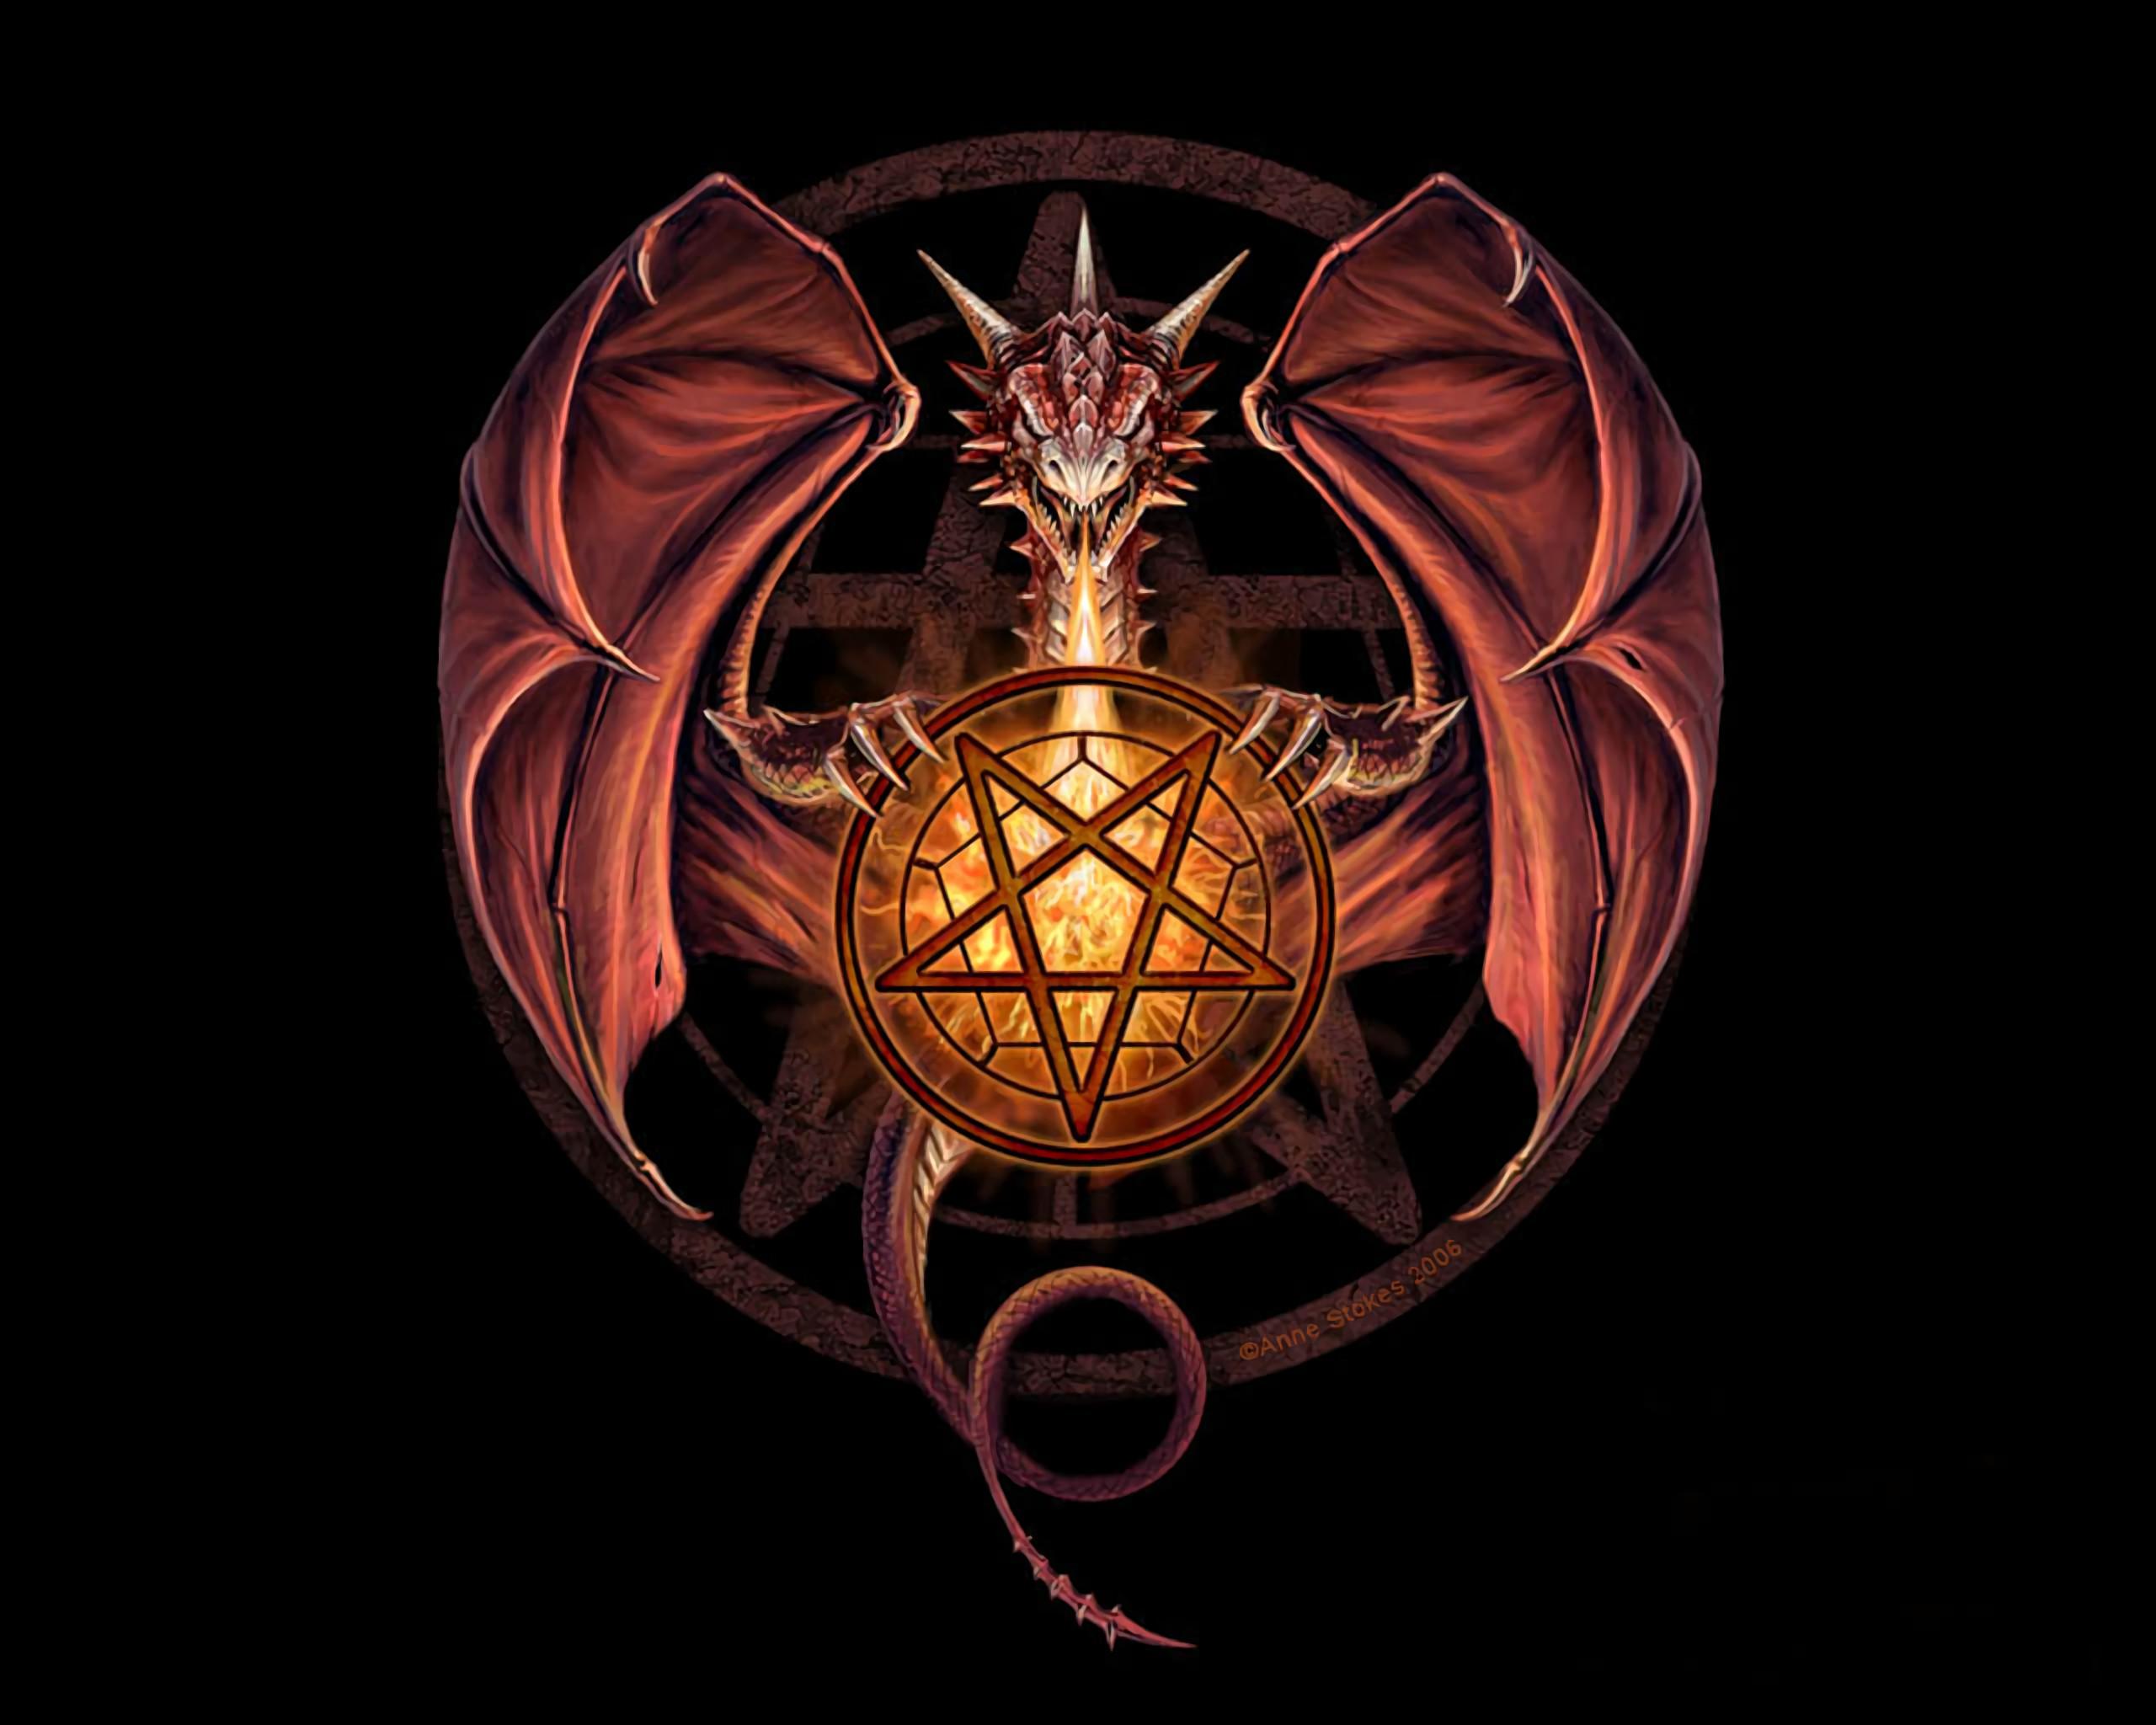 Wiccan Pentagram Wallpaper 53 Images